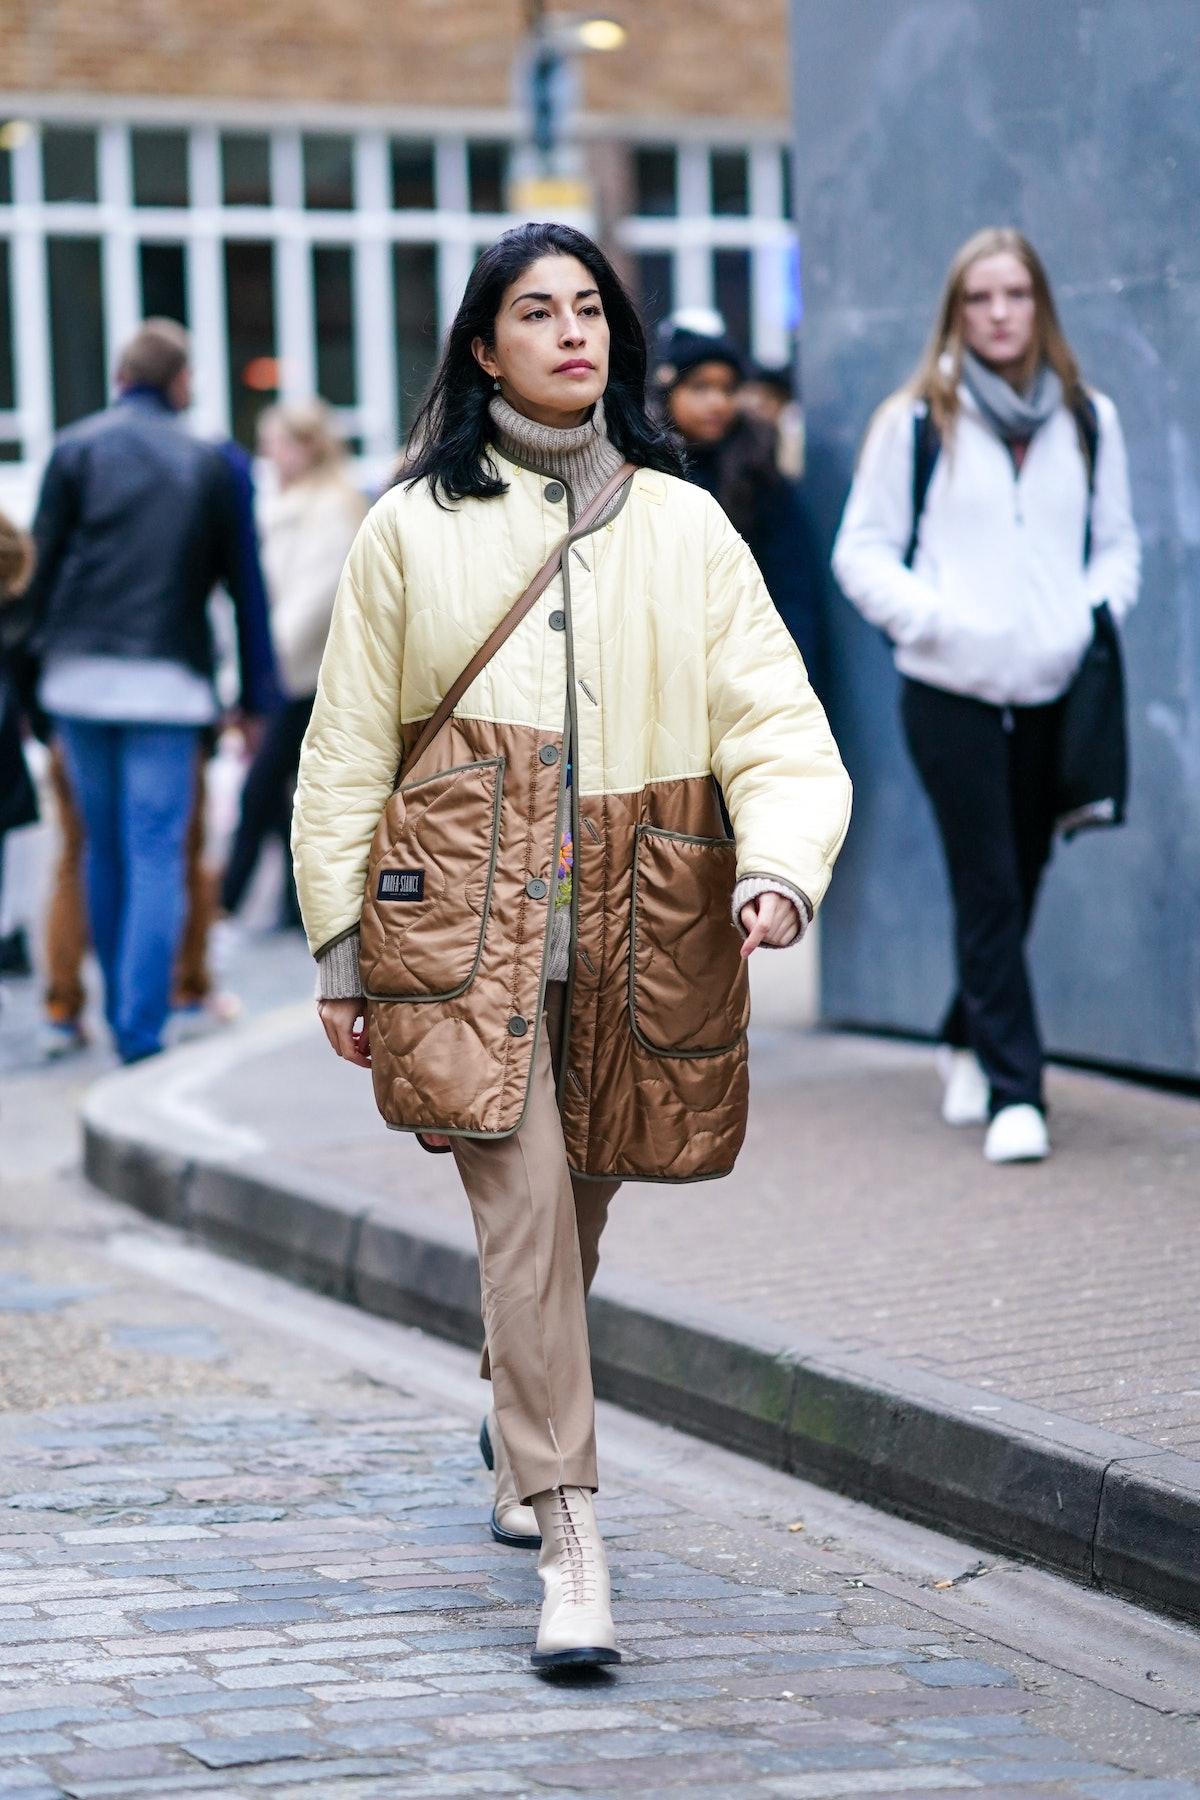 caroline issa wears marfa stance jacket